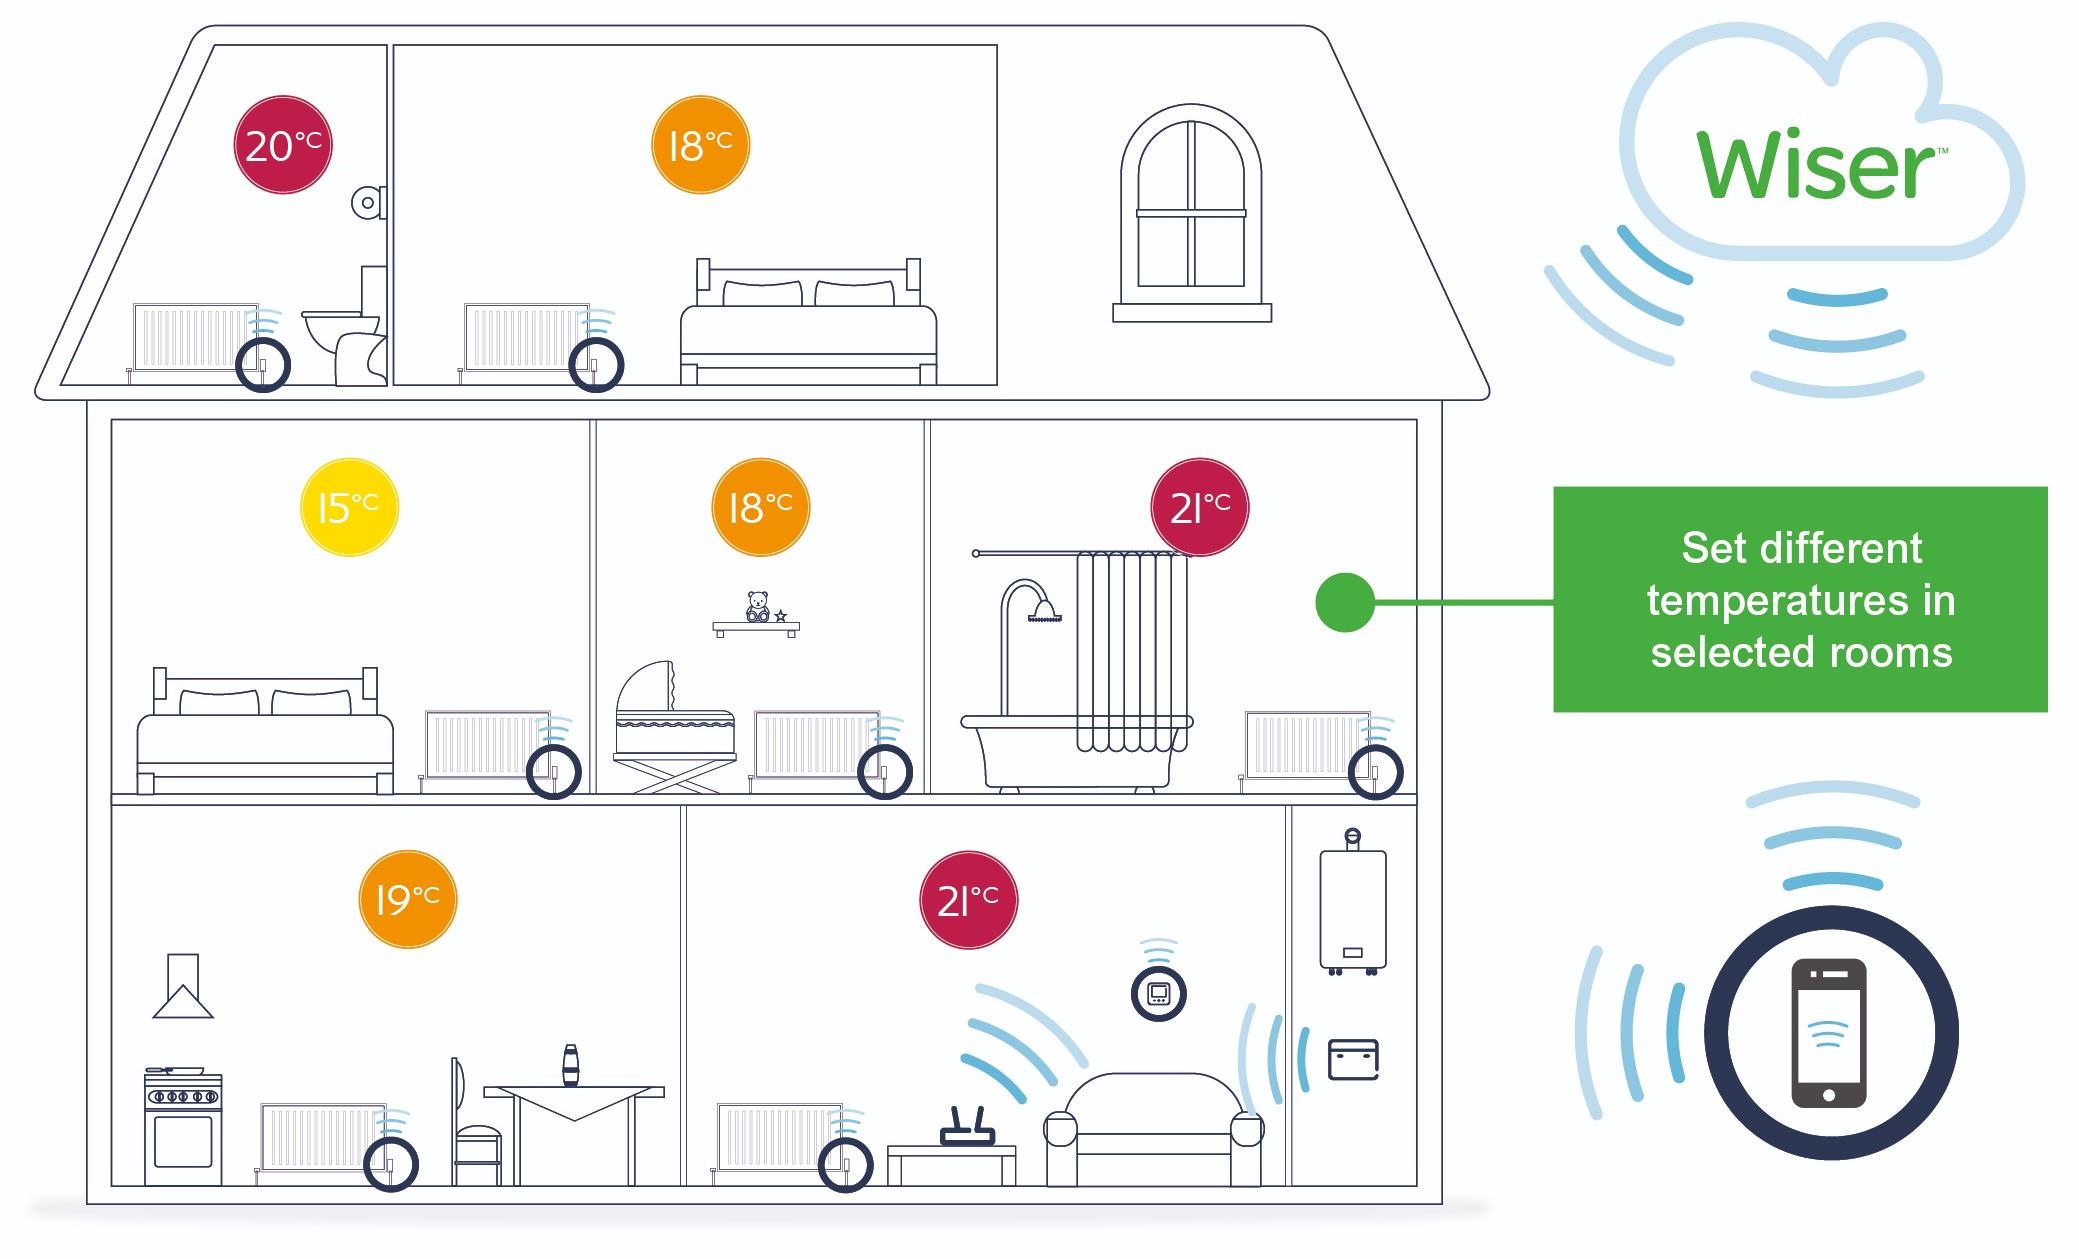 multi-zone heating controls by Drayton Wiser